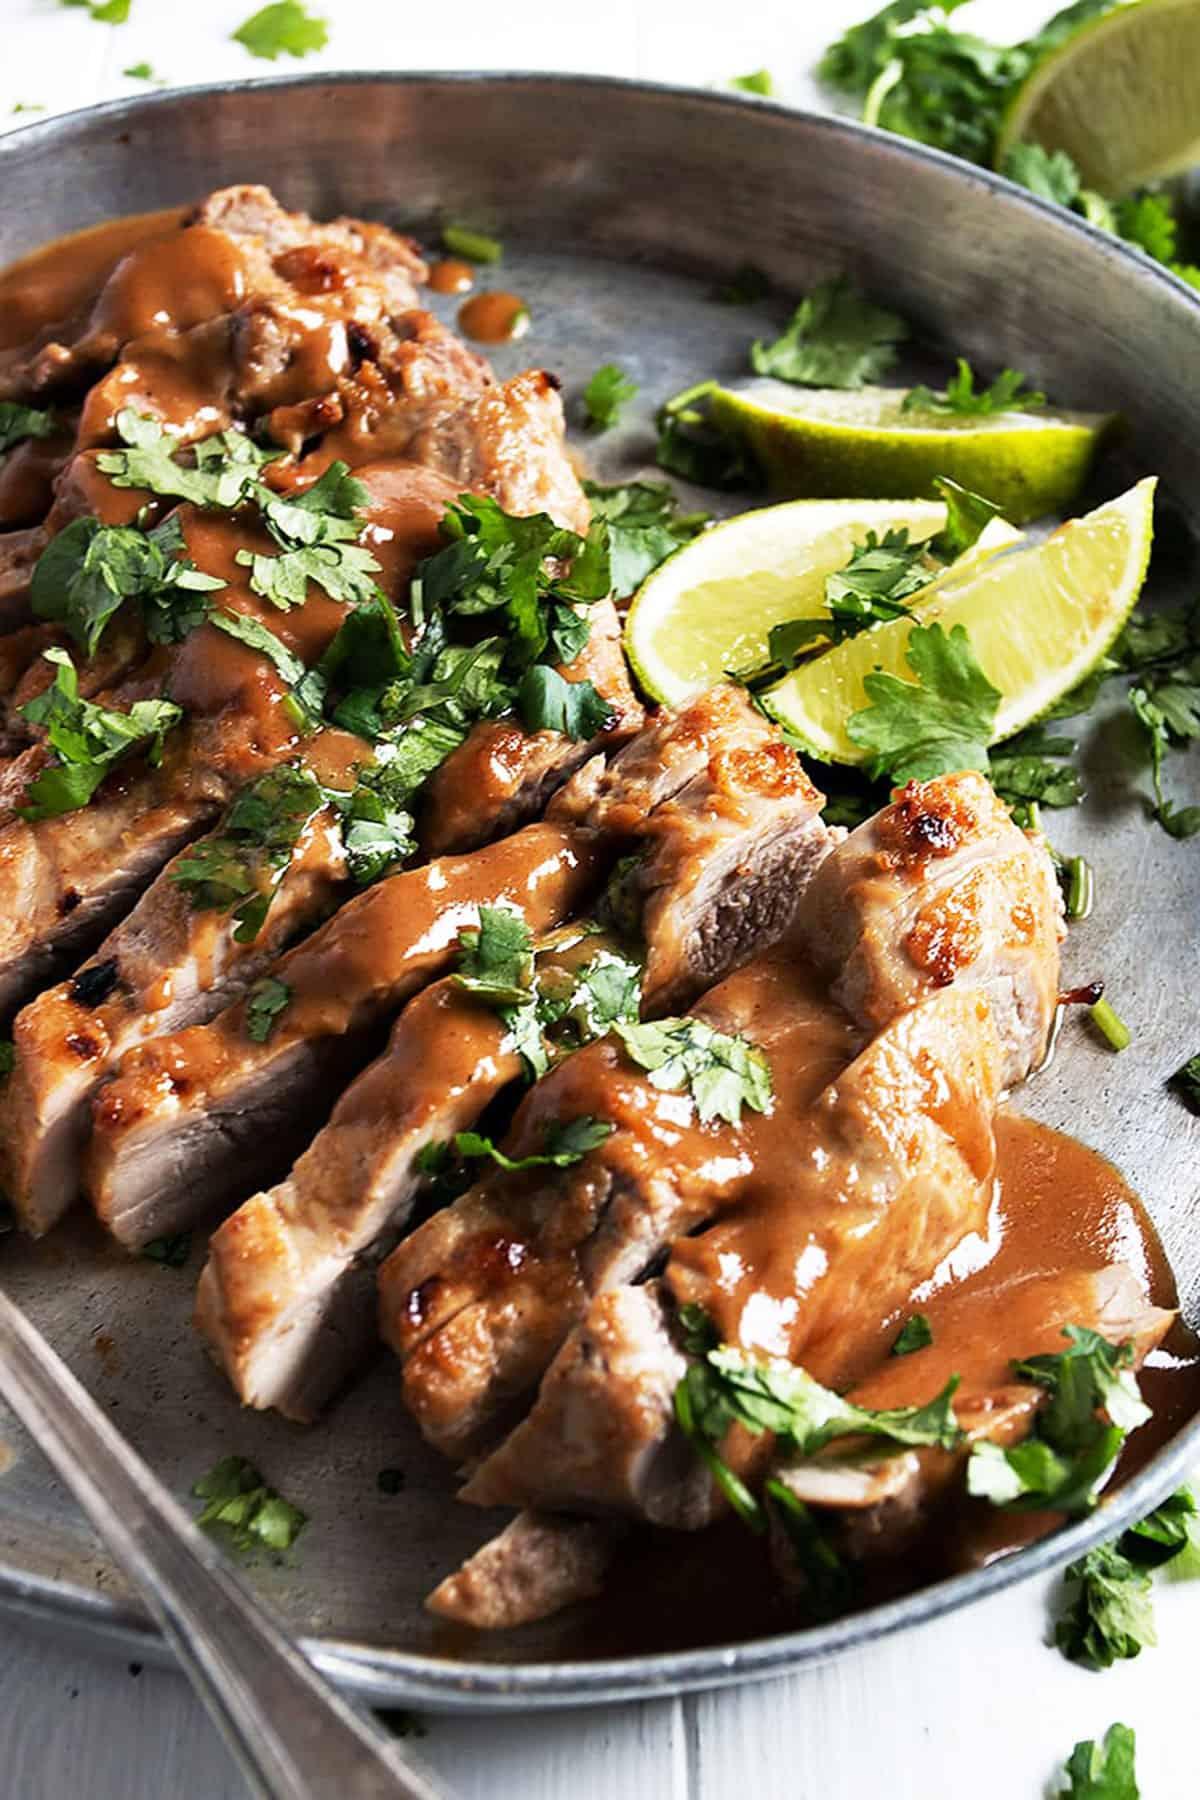 pork tenderloin sliced with peanut sauce